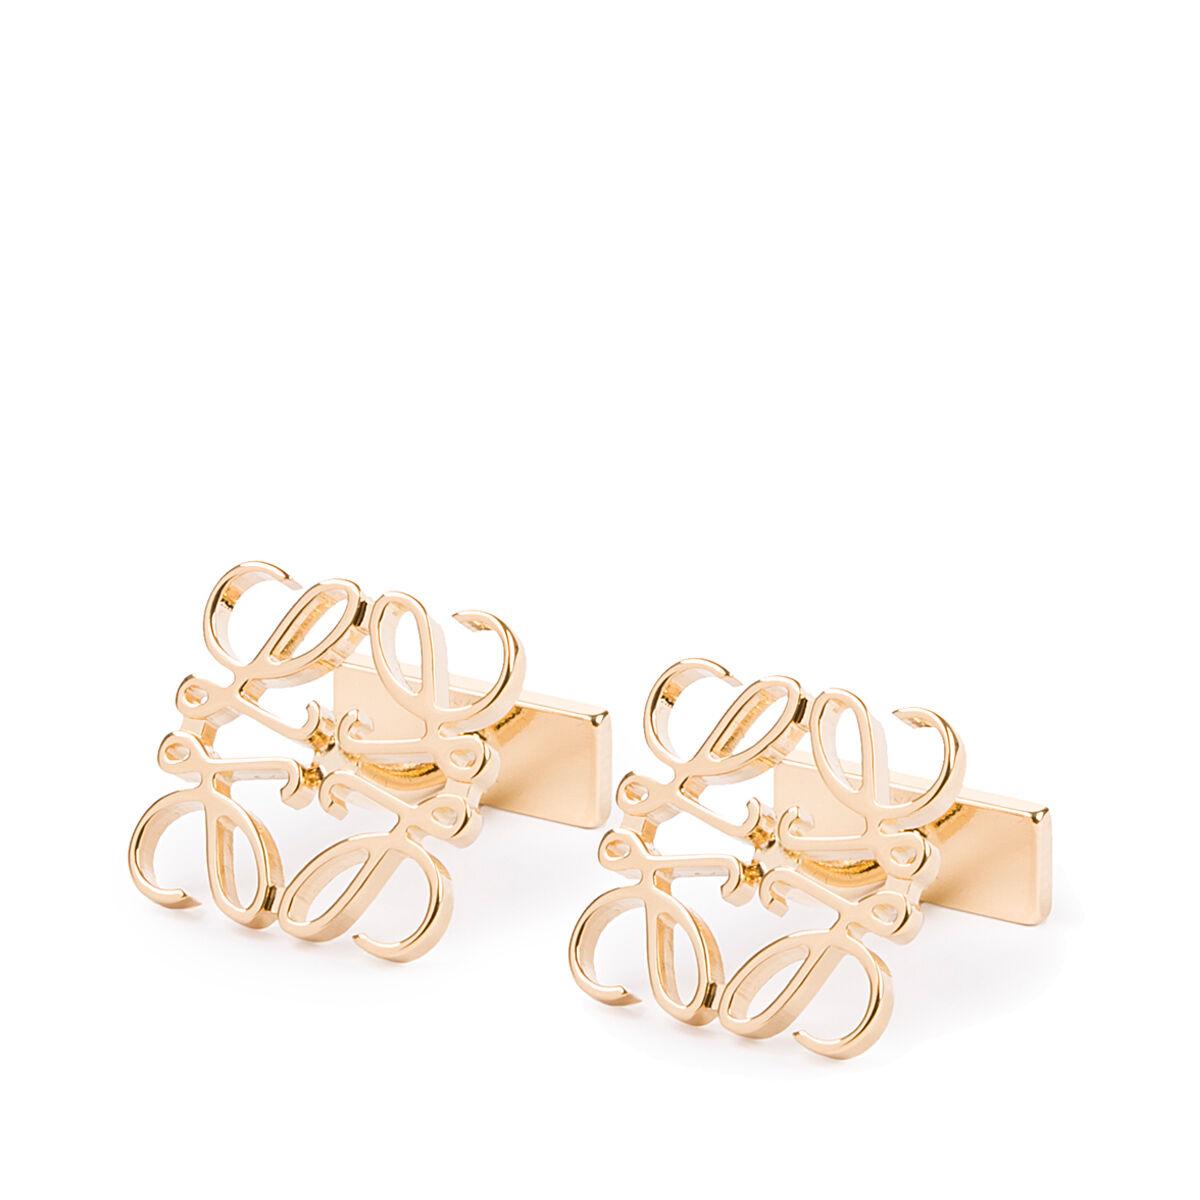 LOEWE Anagram Cufflink Gold all